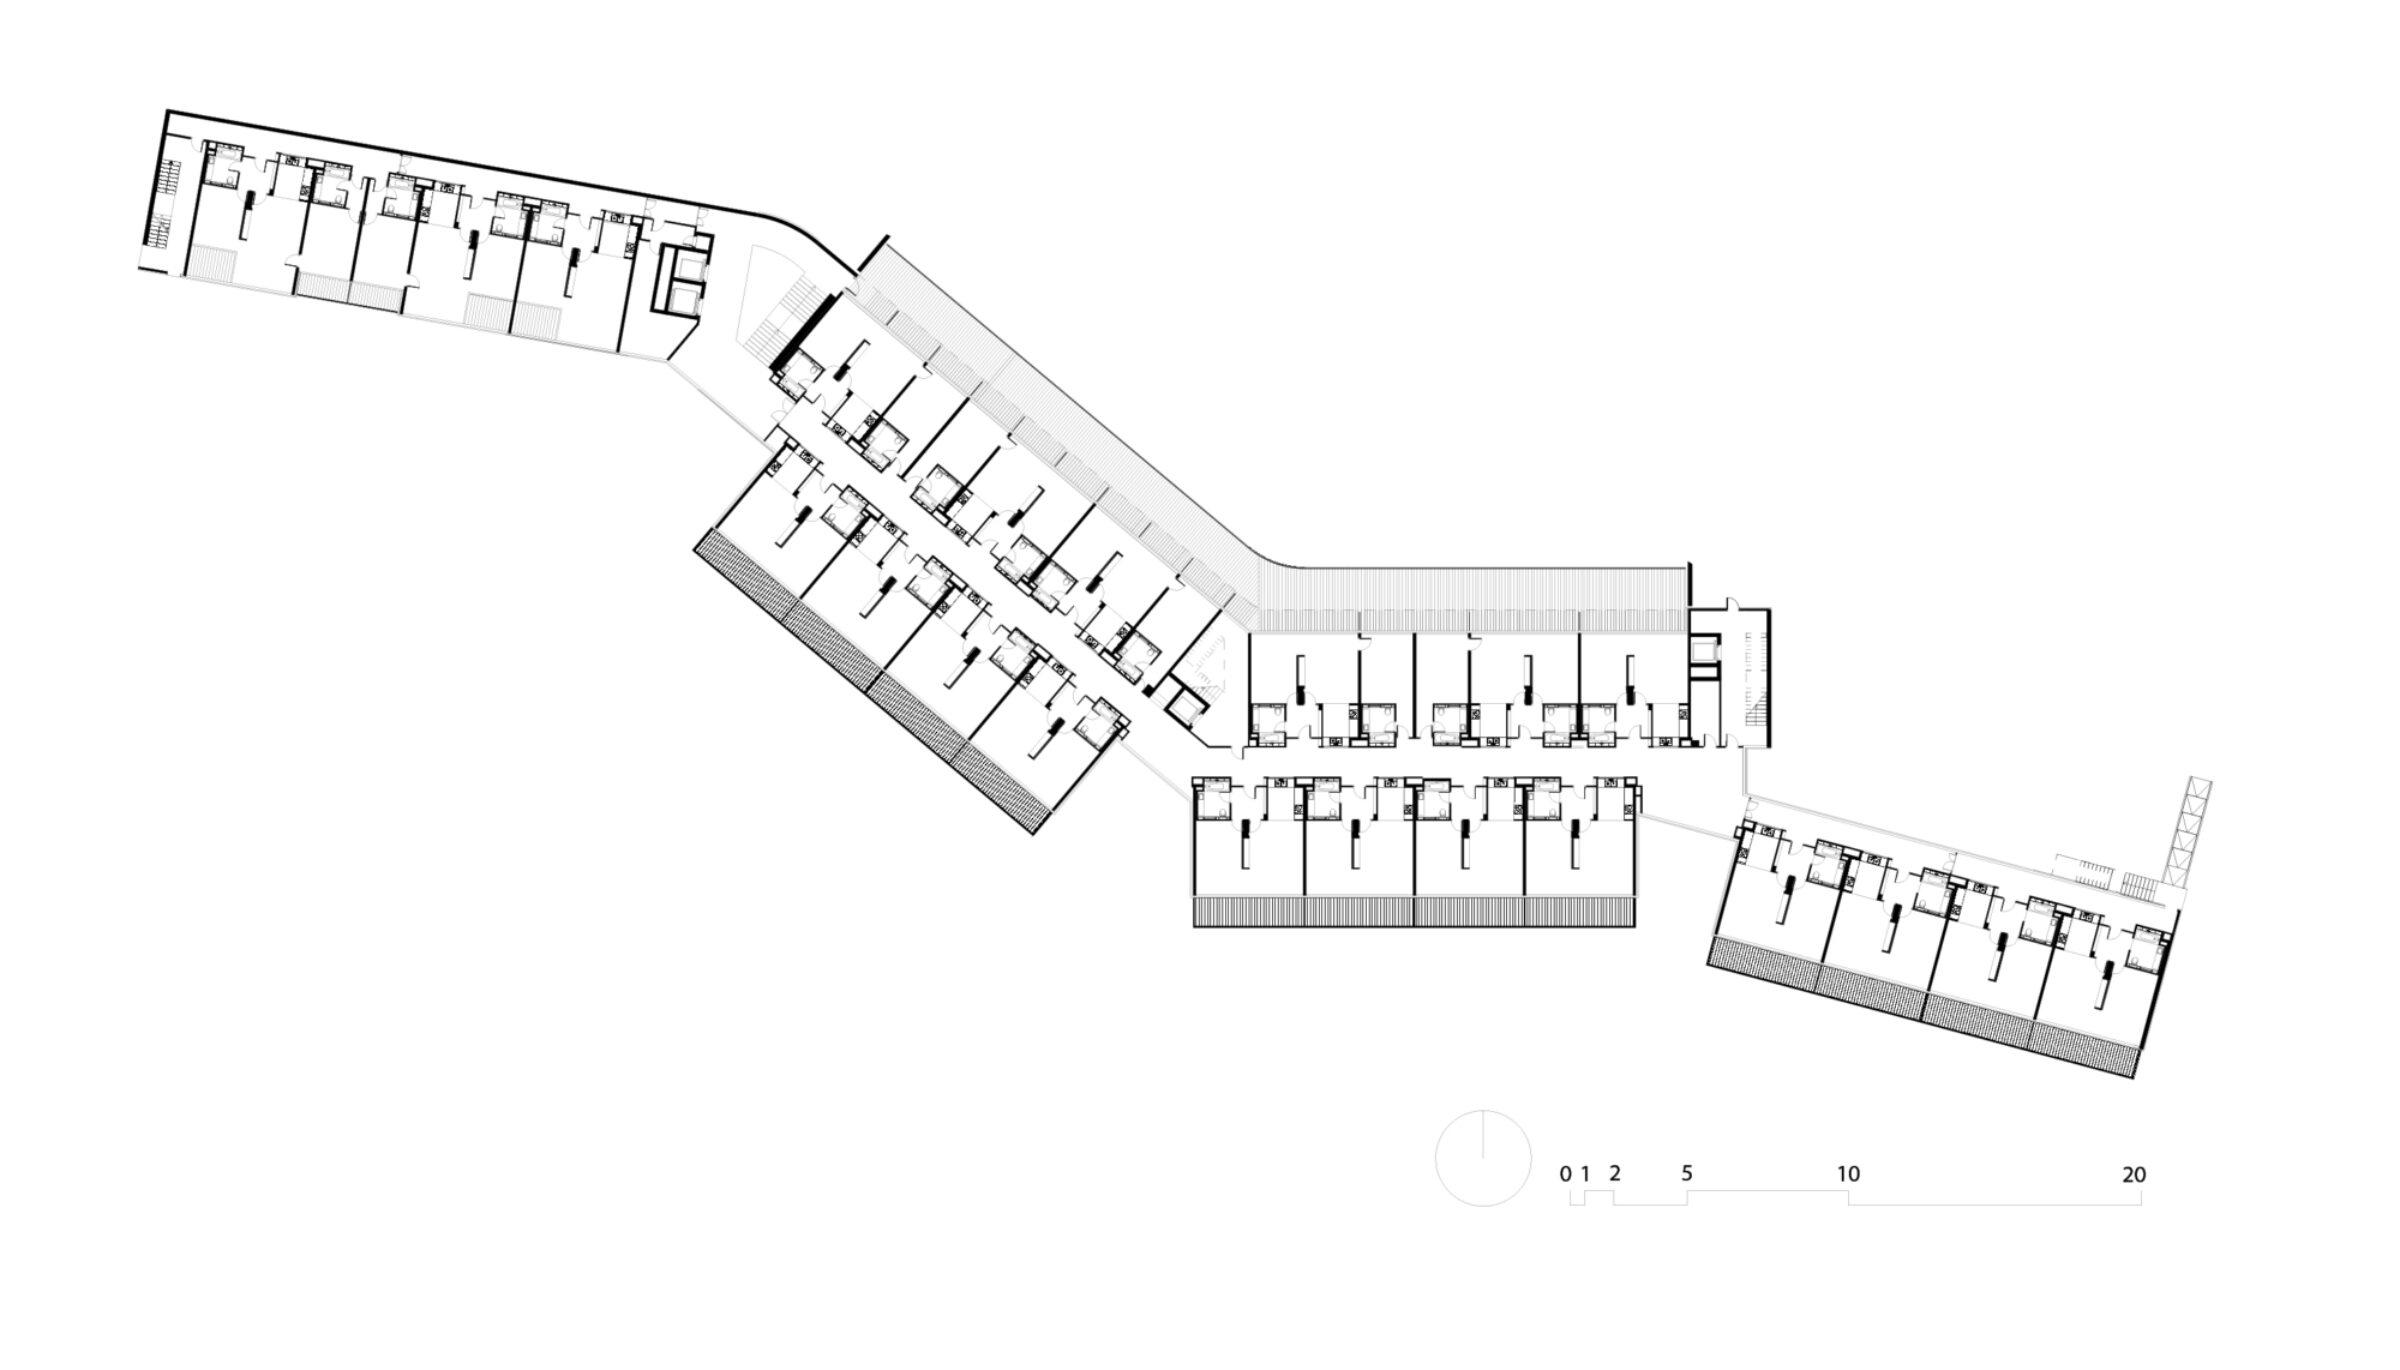 Grundriss 2. Ebene